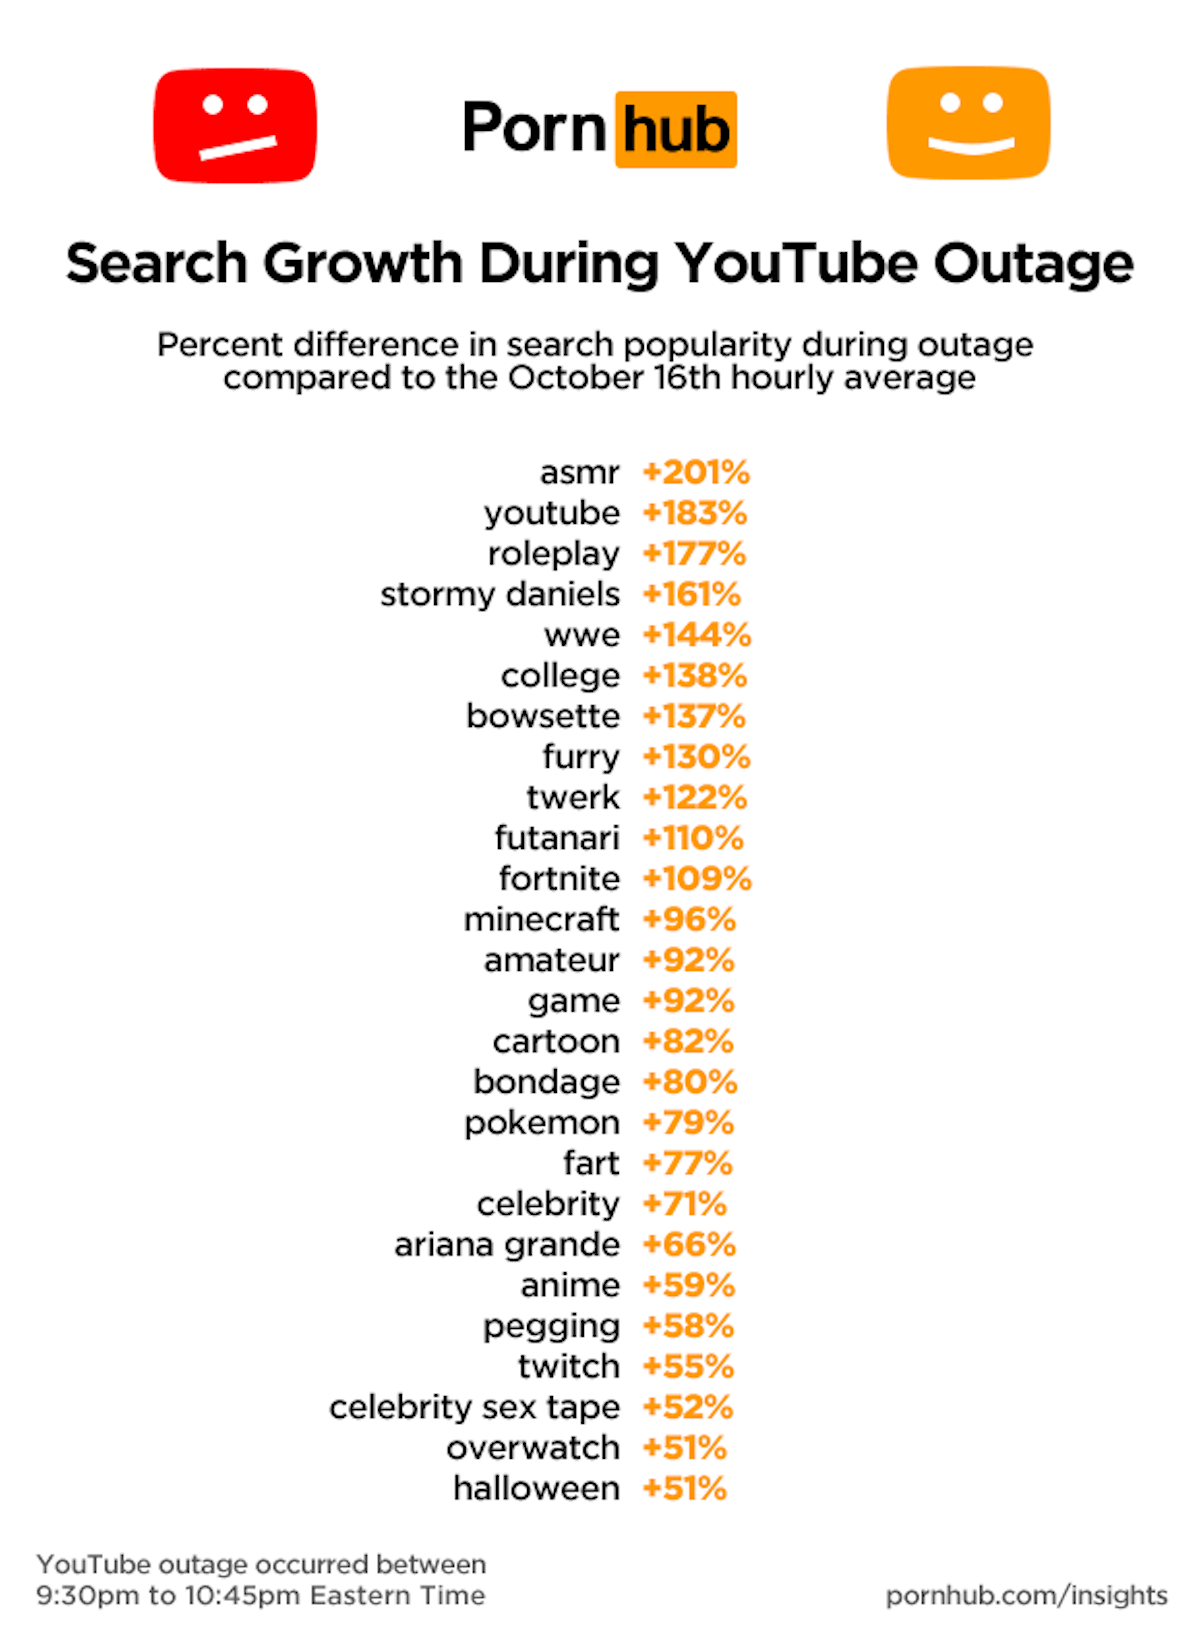 YouTube世界規模アクセス障害で人気アダルトサイト「Pornhub」へのアクセスが増加!? technology181018_pronhub-youtube_1-1200x1649